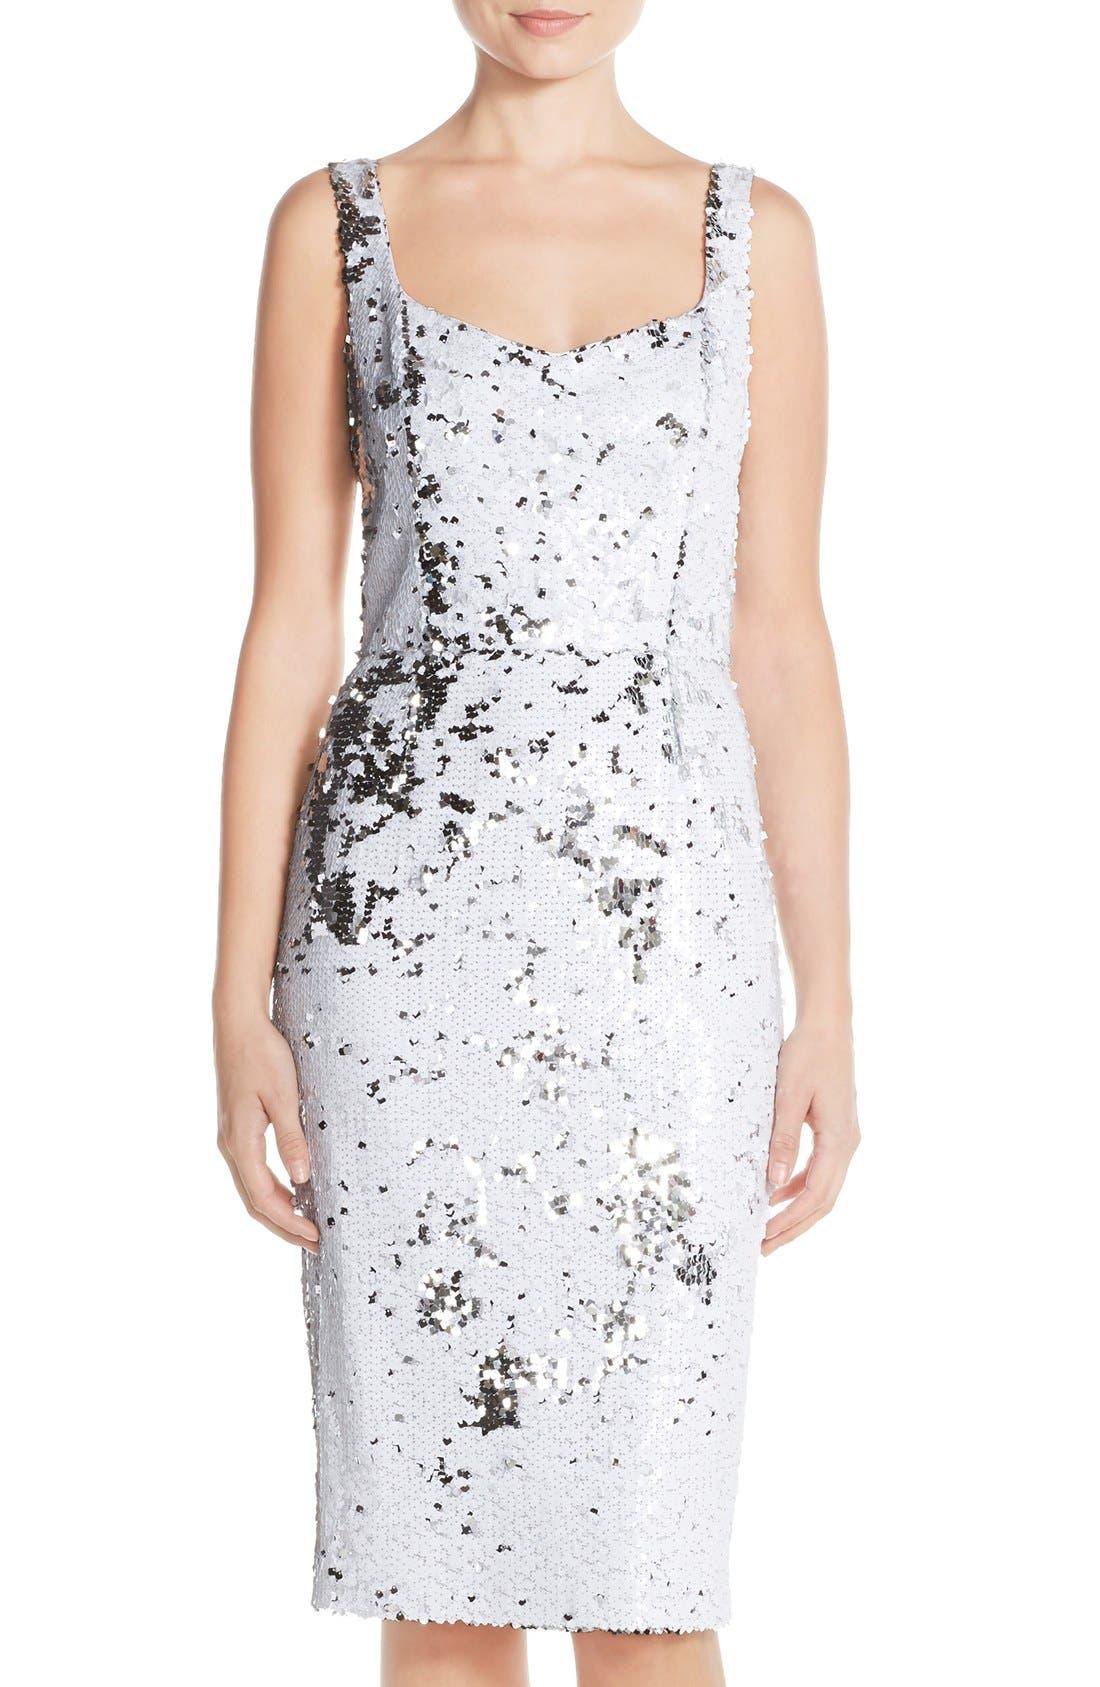 Alternate Image 1 Selected - Jay Godfrey 'Moncton' Sequin Sheath Dress